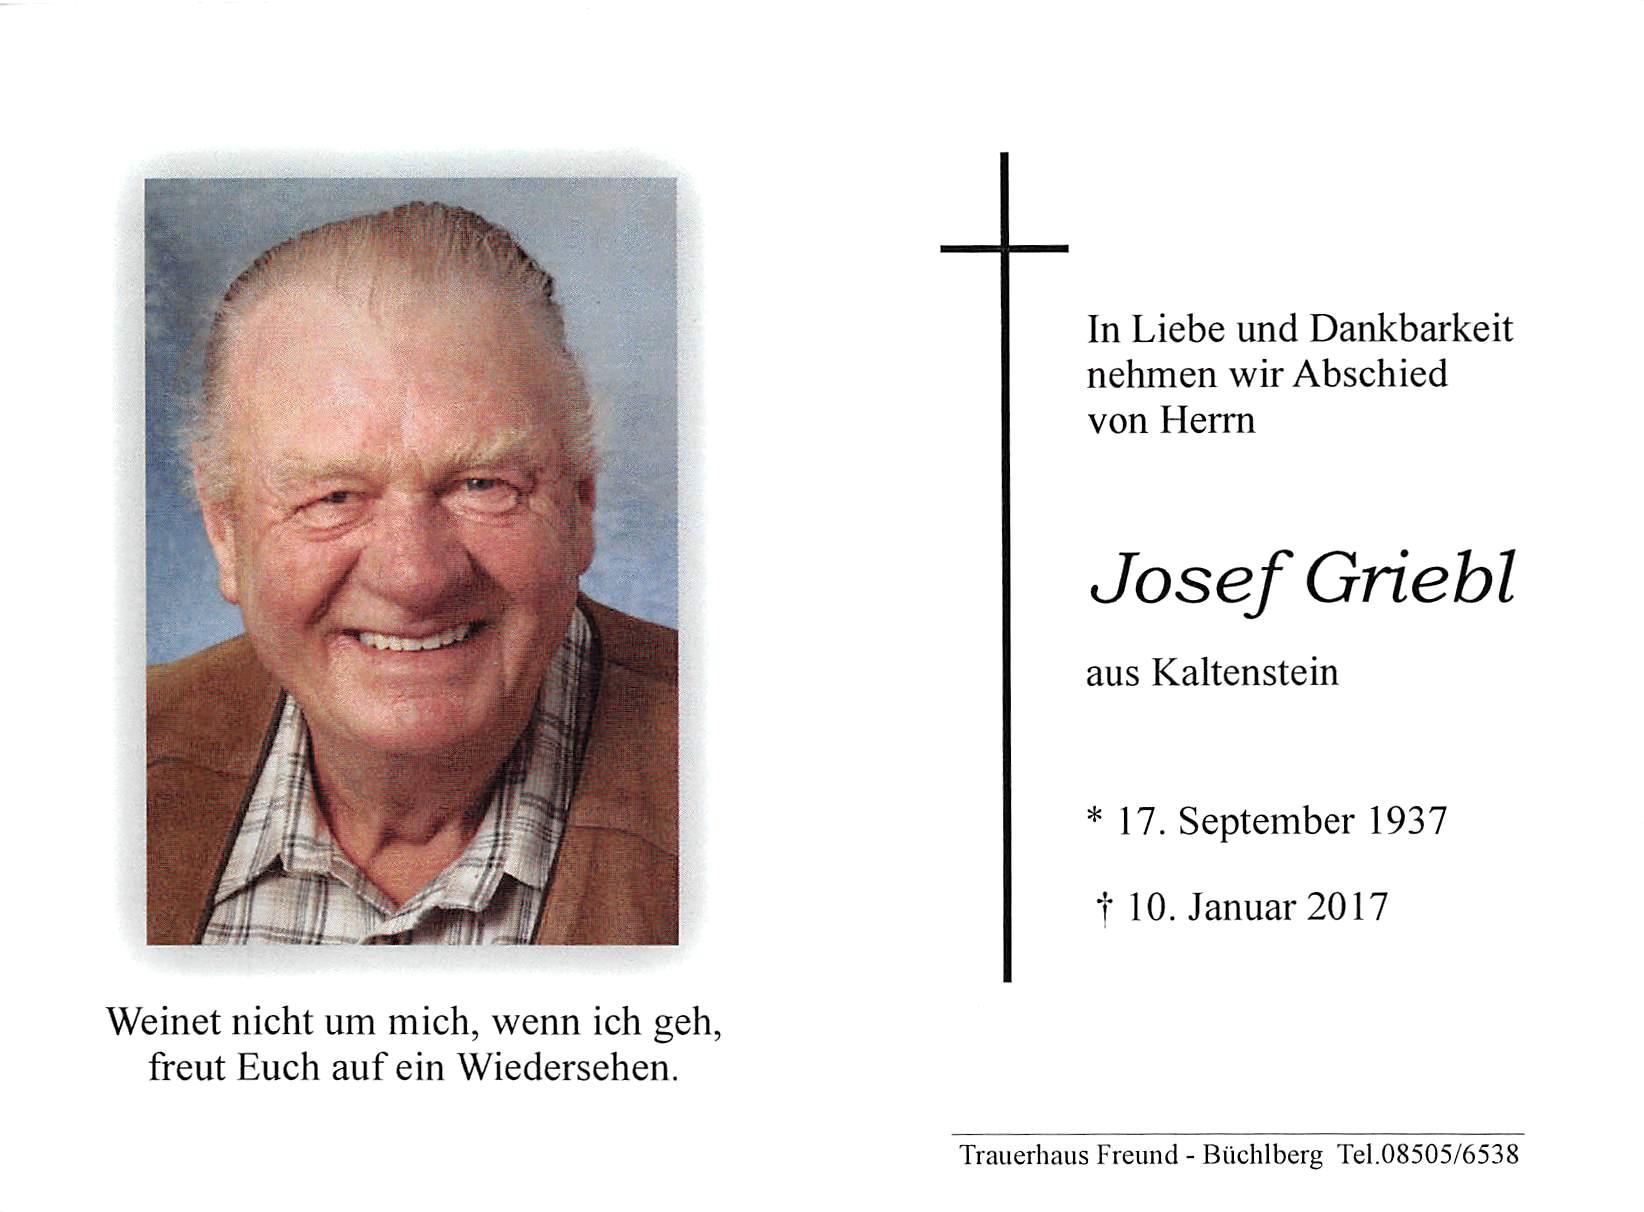 2017-01-10-Griebl-Josef